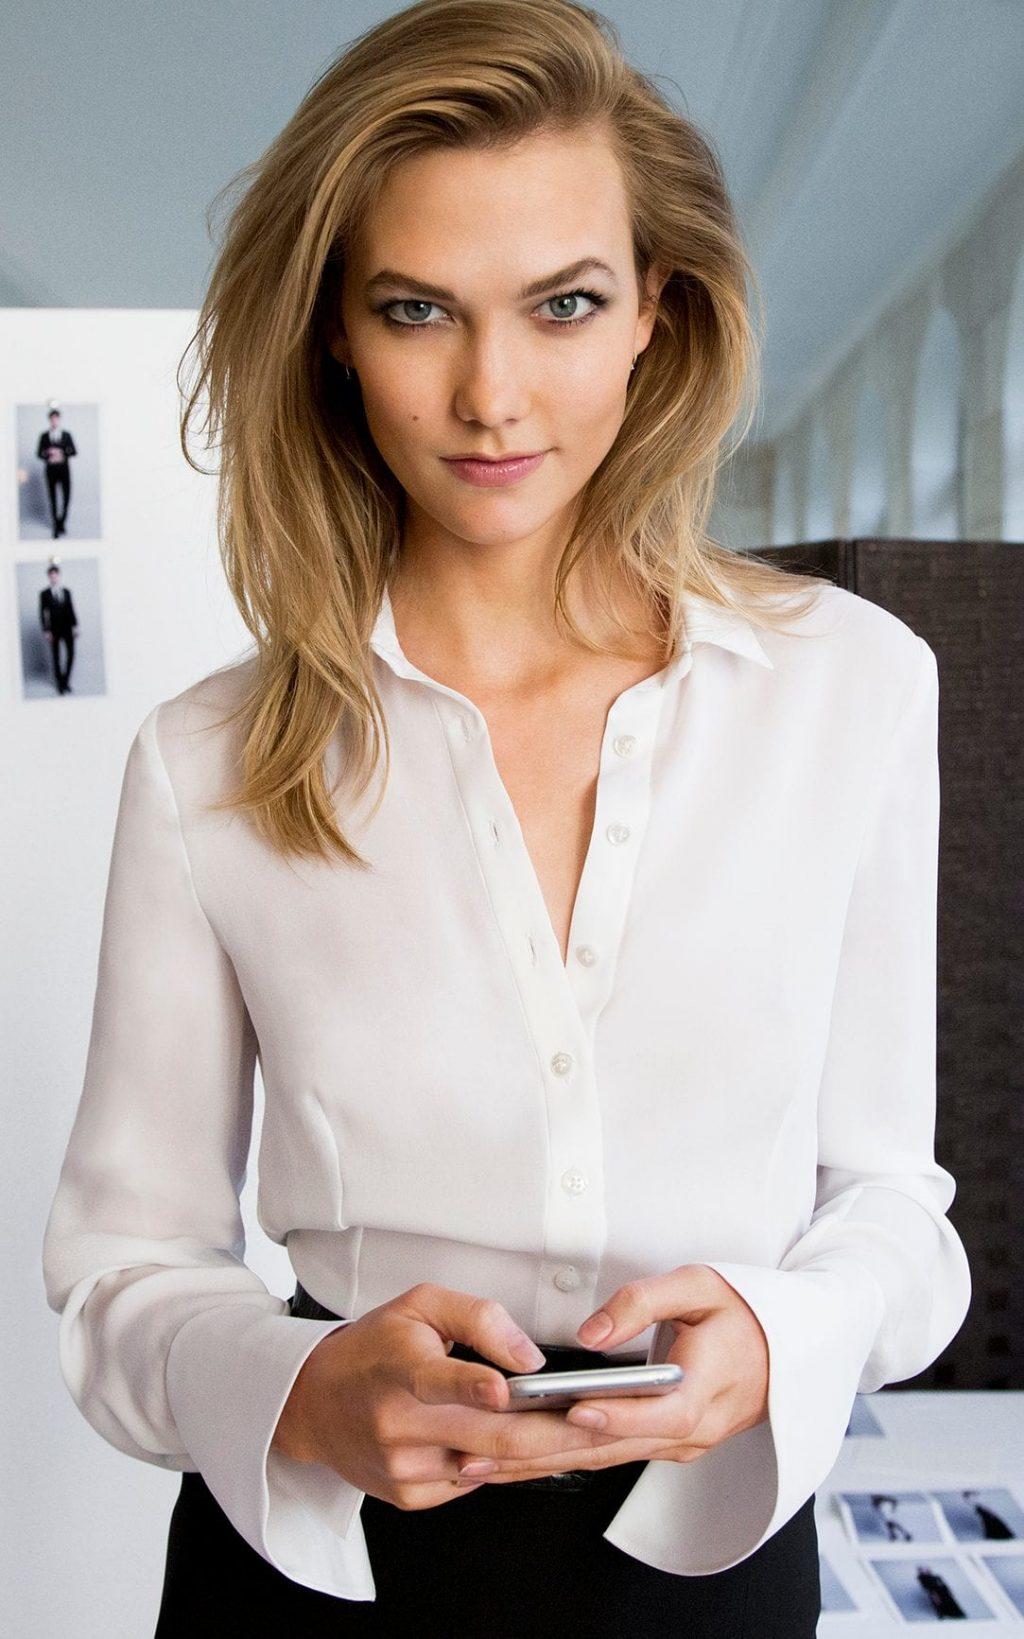 H&M x Moschino Karlie Kloss